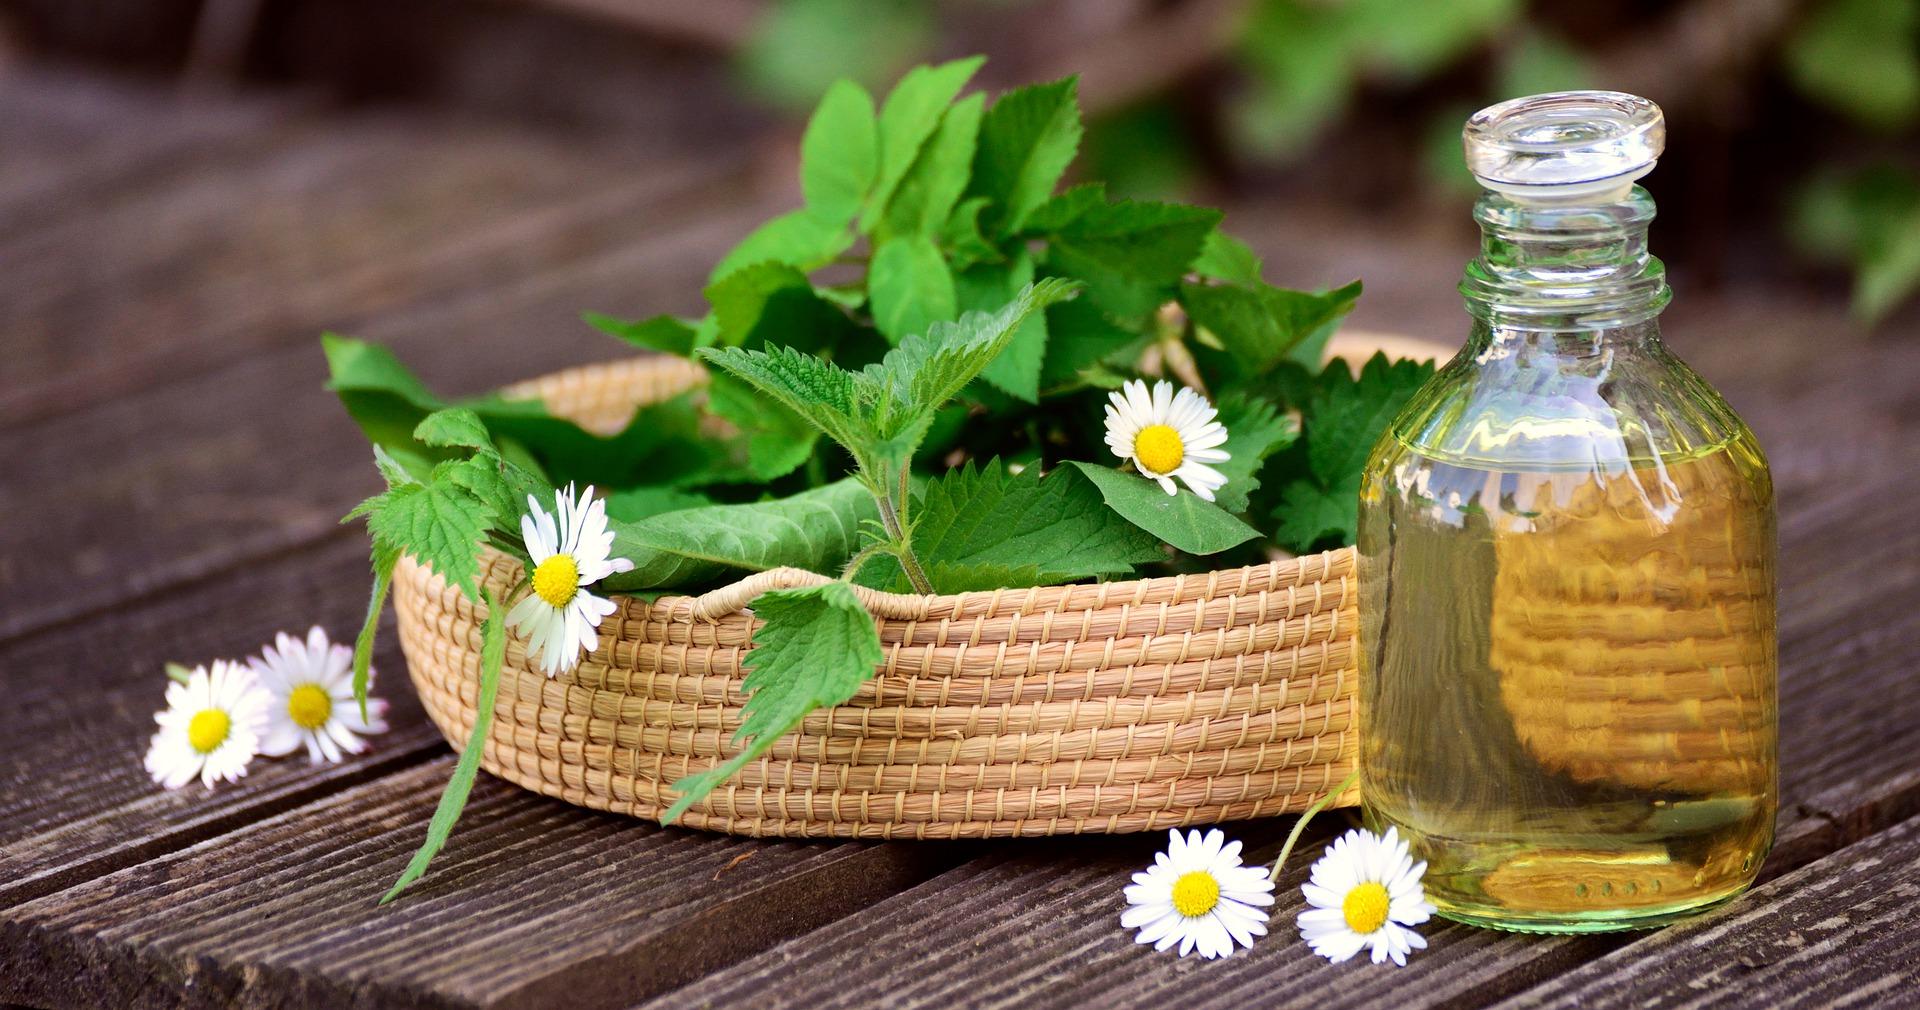 herb garden, Create and maintain herb garden, Best Garden, Home And DIY Tips